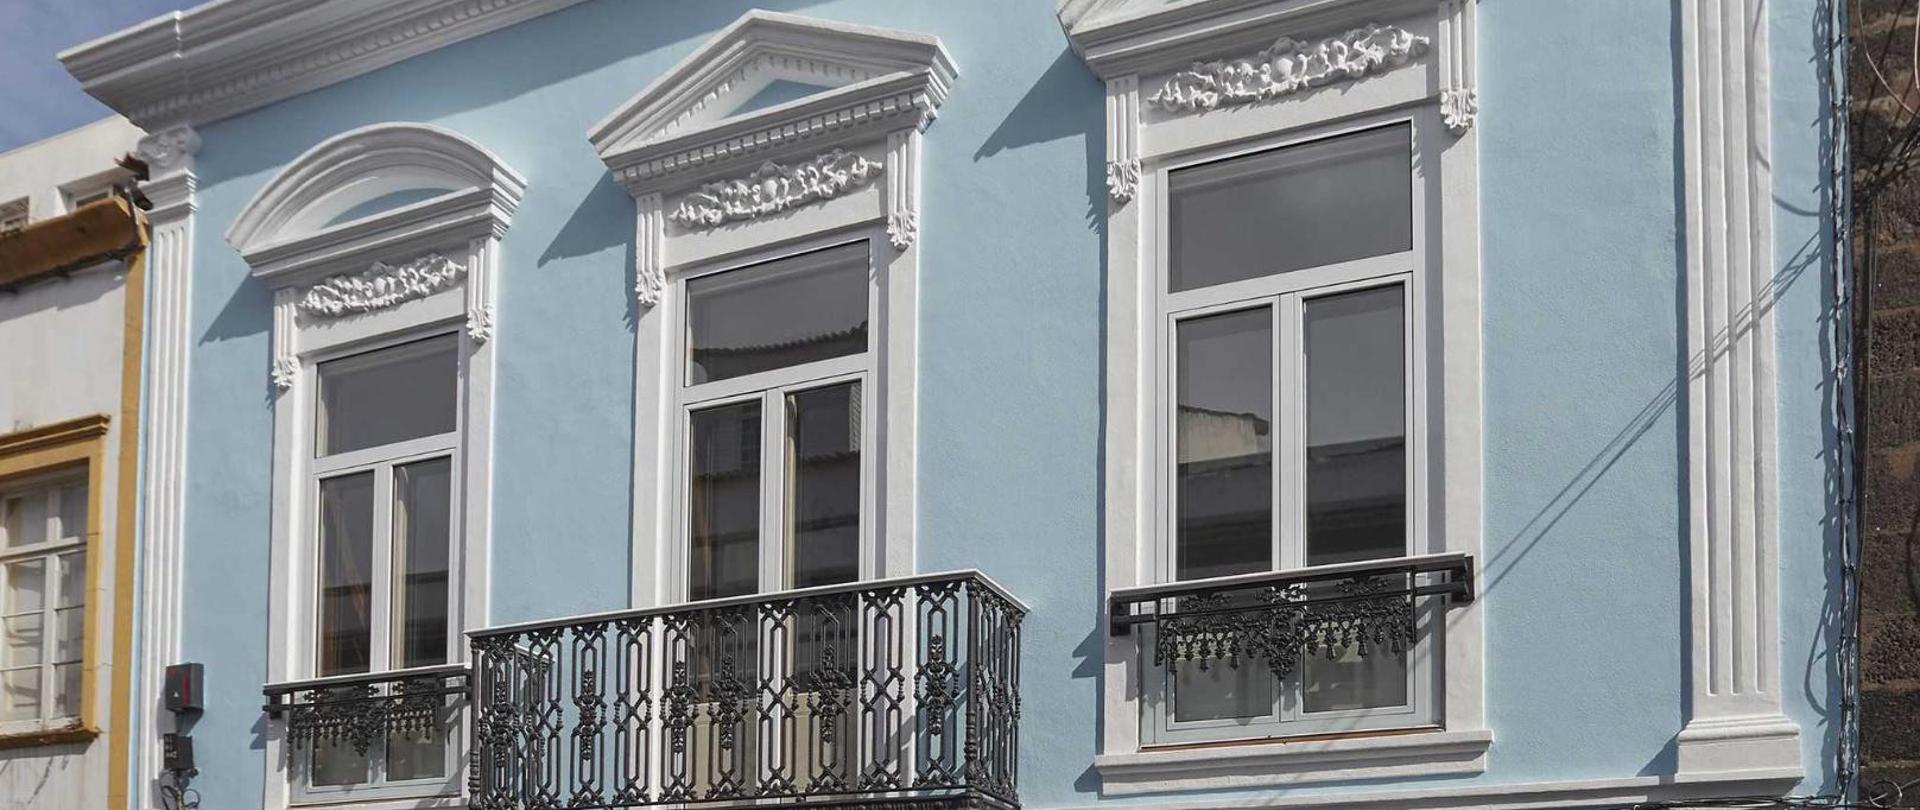 casa-da-cidade-ext-317-net06082017-1.jpg